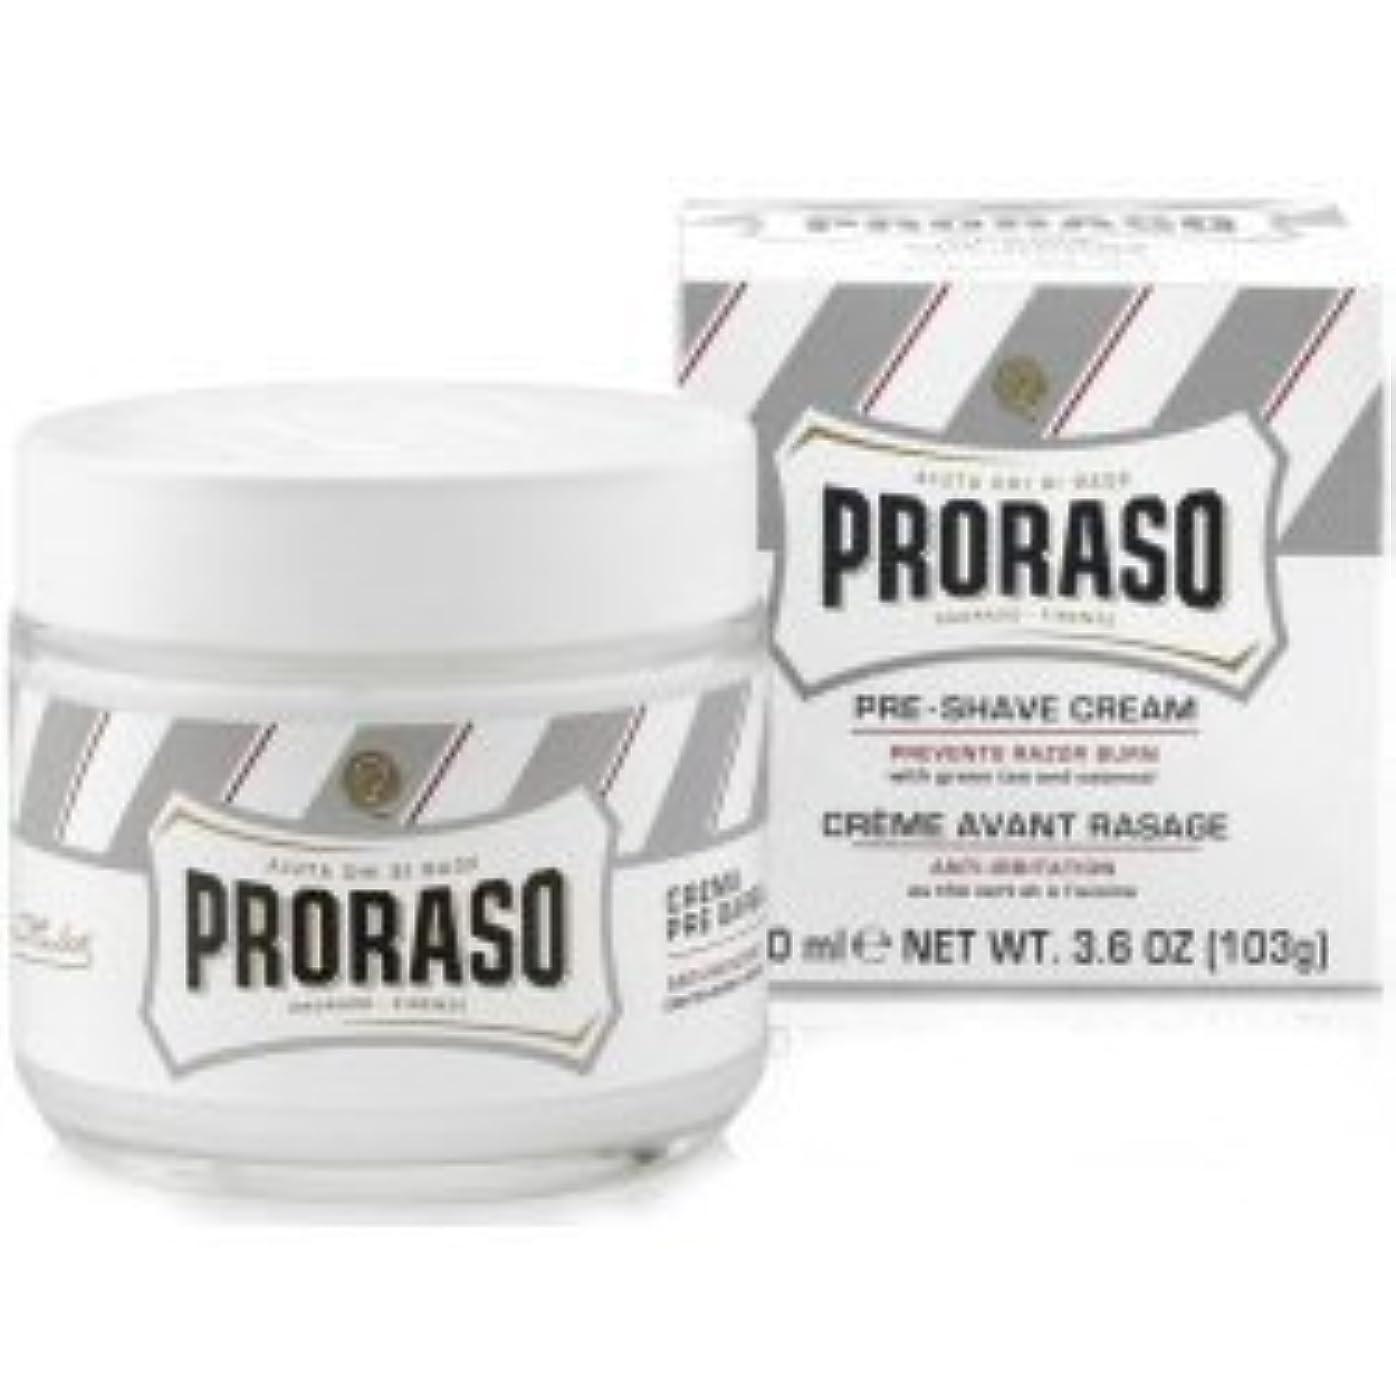 資格土曜日農業Proraso Pre & Post Shave Cream Sensitive Skin 100ml by Proraso [並行輸入品]